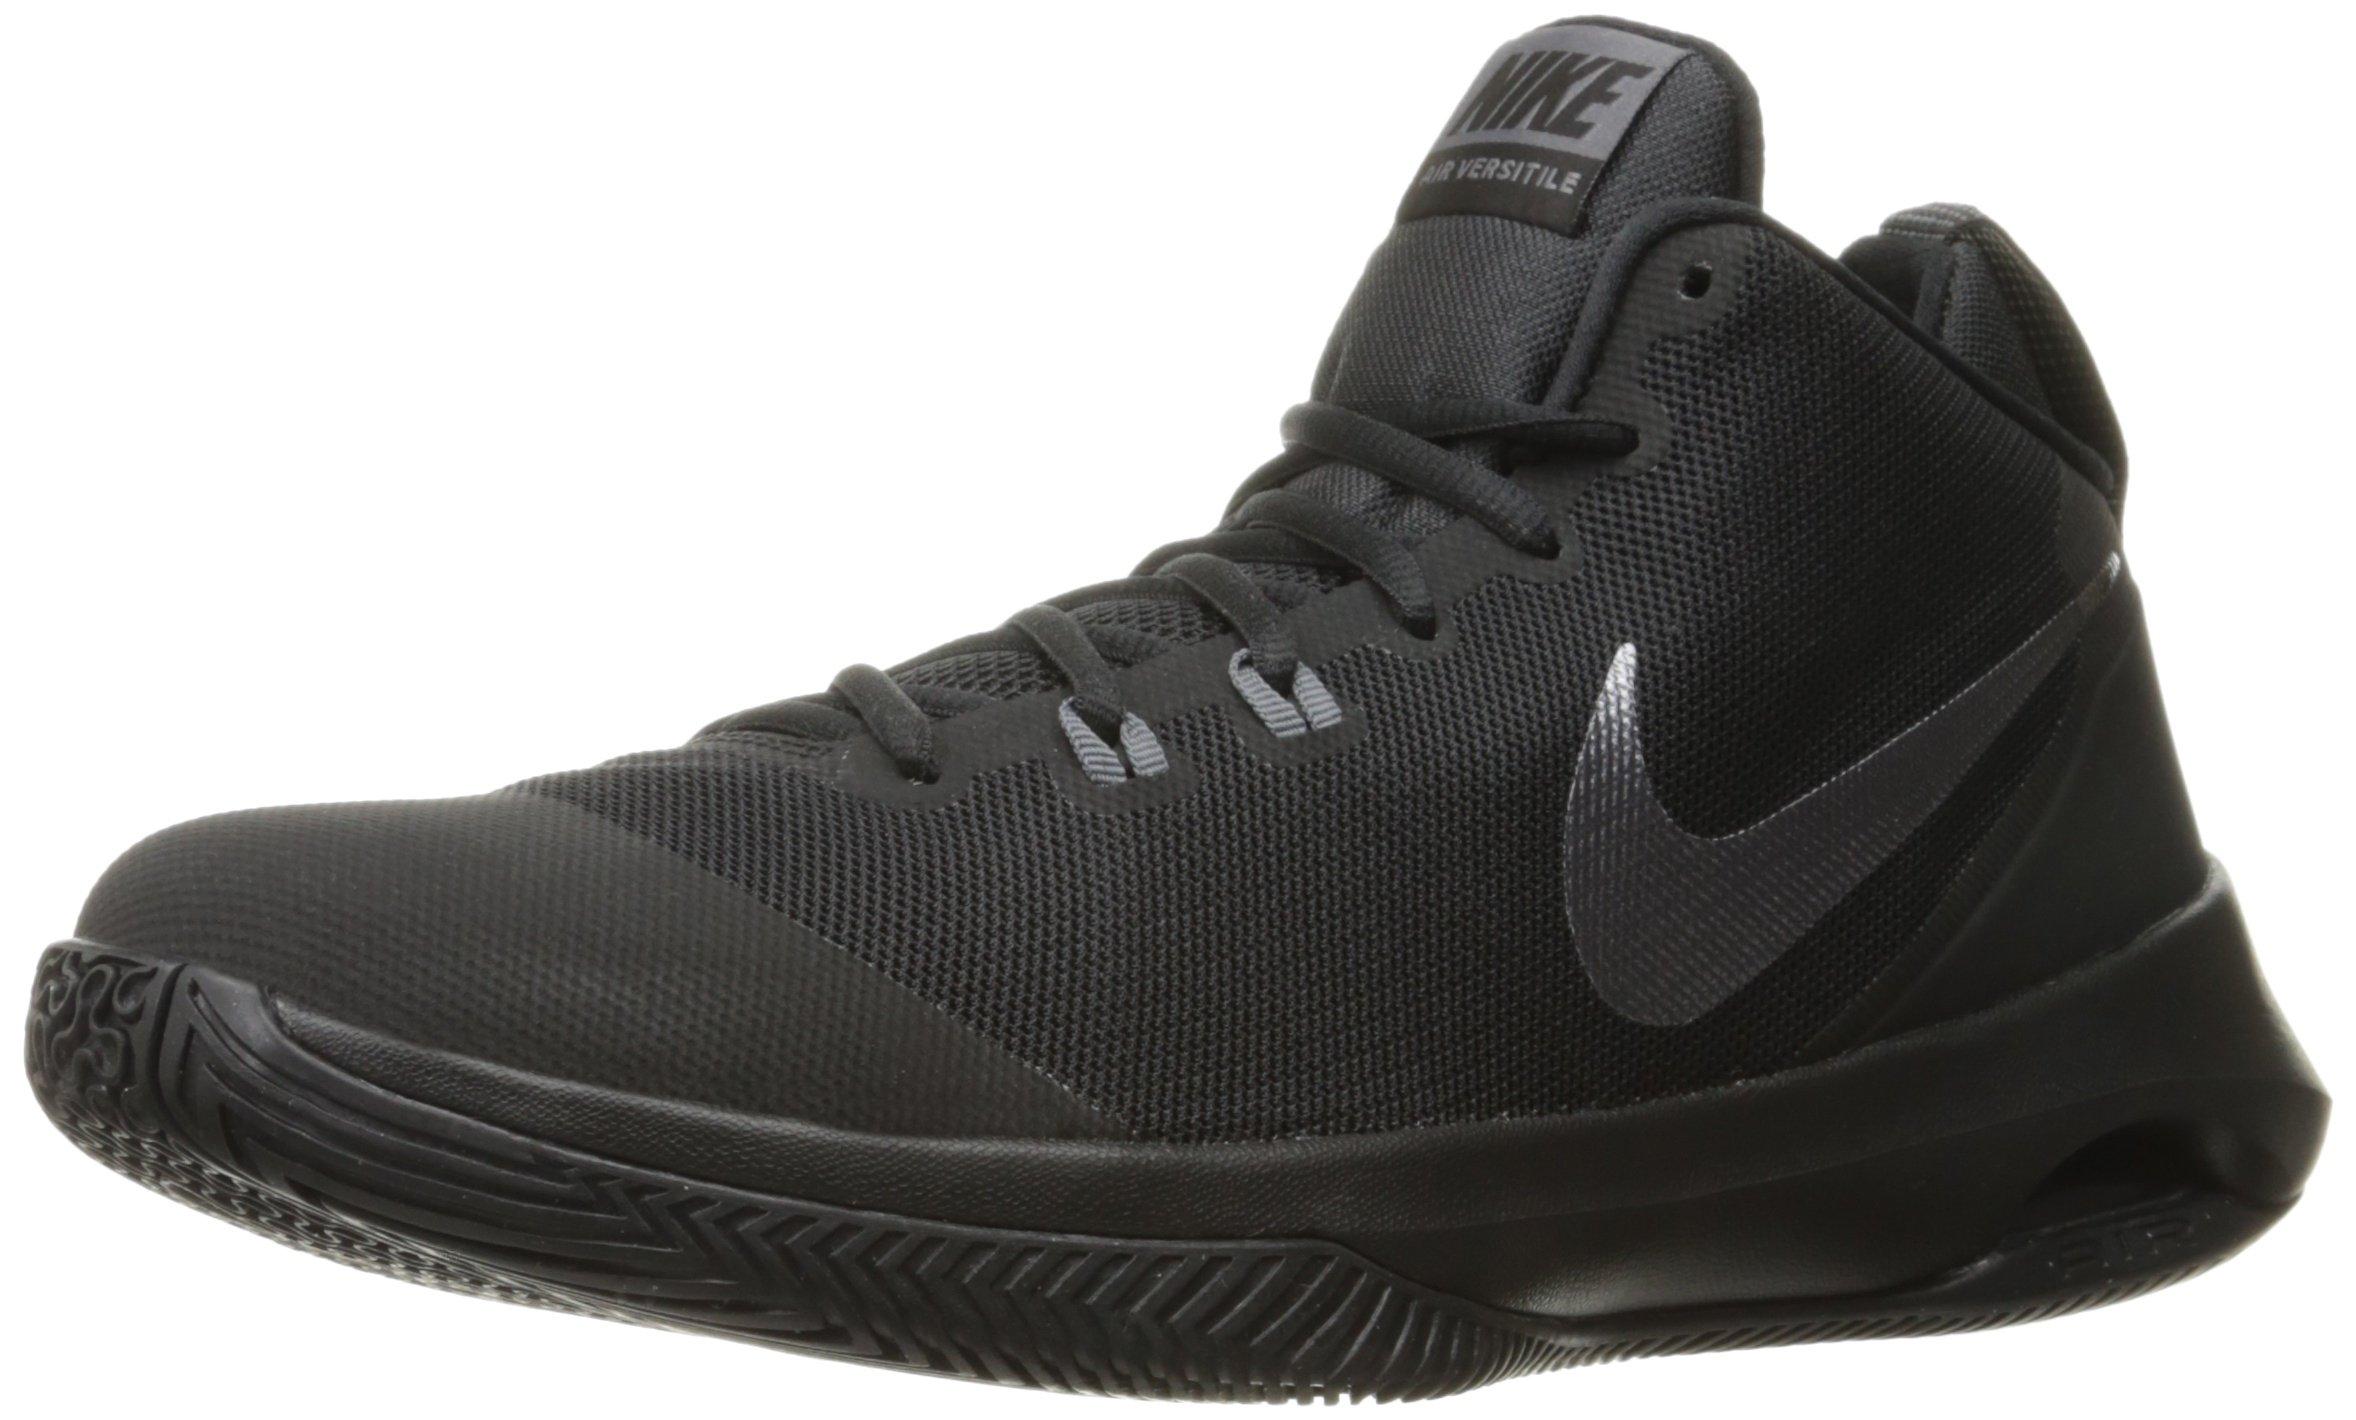 NIKE Men's Air Versitile Nubuck Basketball Shoe, Black/Metallic Dark Grey/Dark Grey, 10 D(M) US by Nike